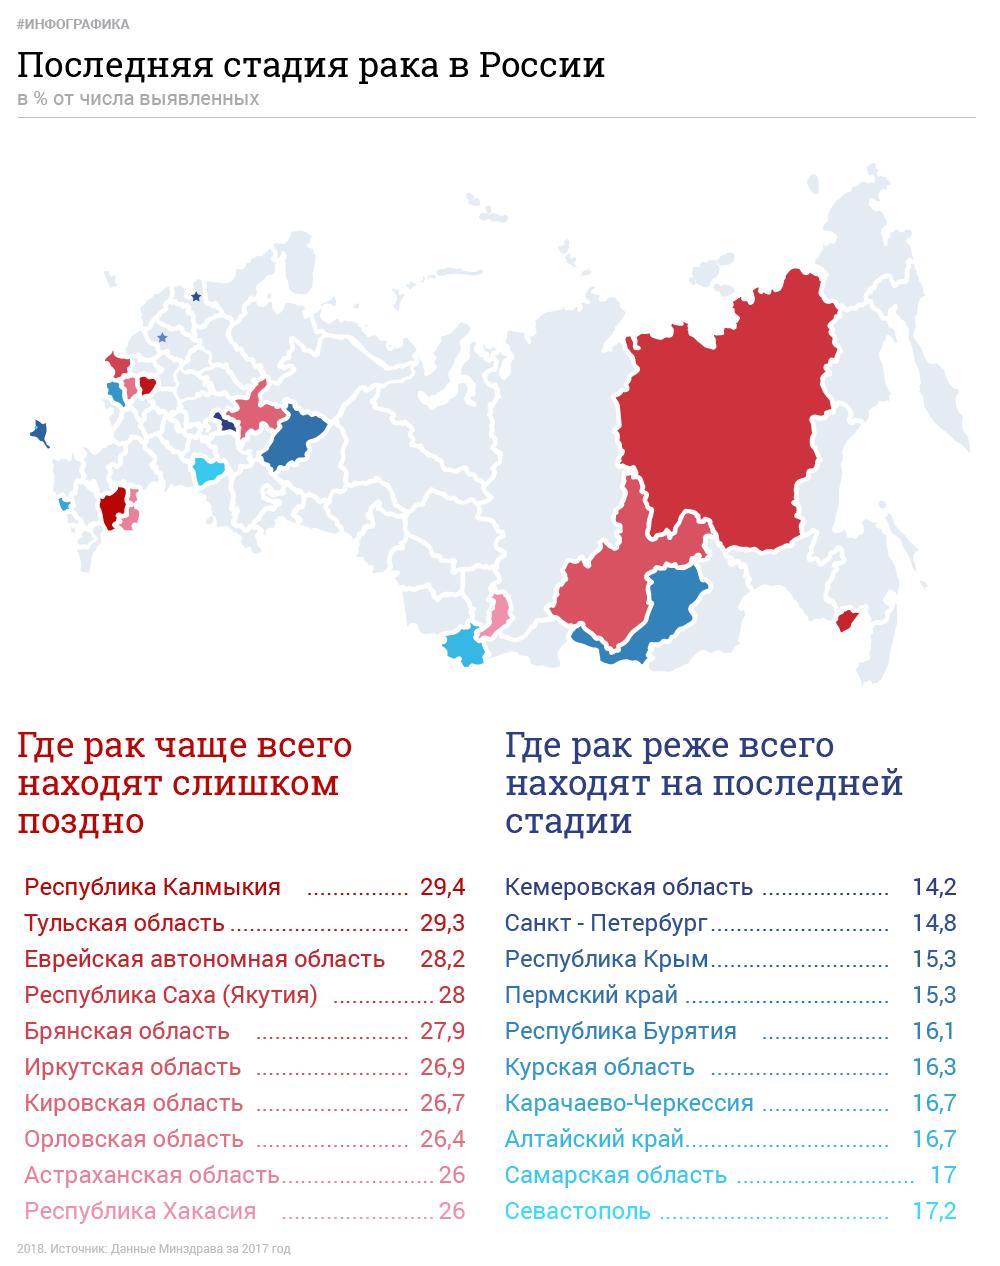 Инфографика L!FE